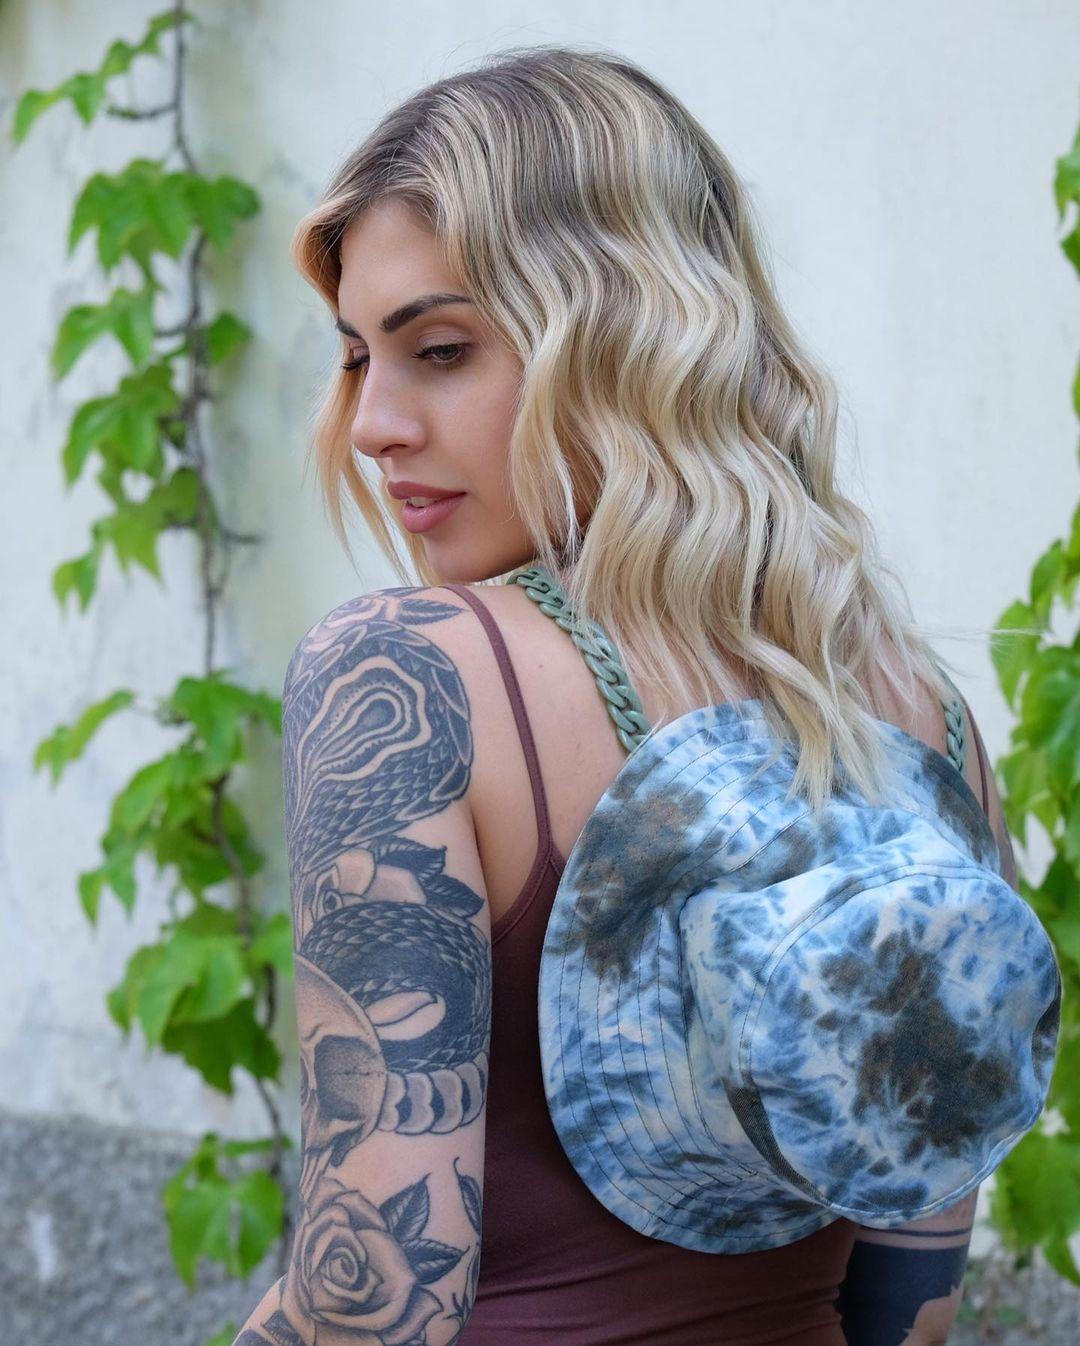 Ludovica-Melisurgo-Wallpapers-Insta-Fit-BIo-13